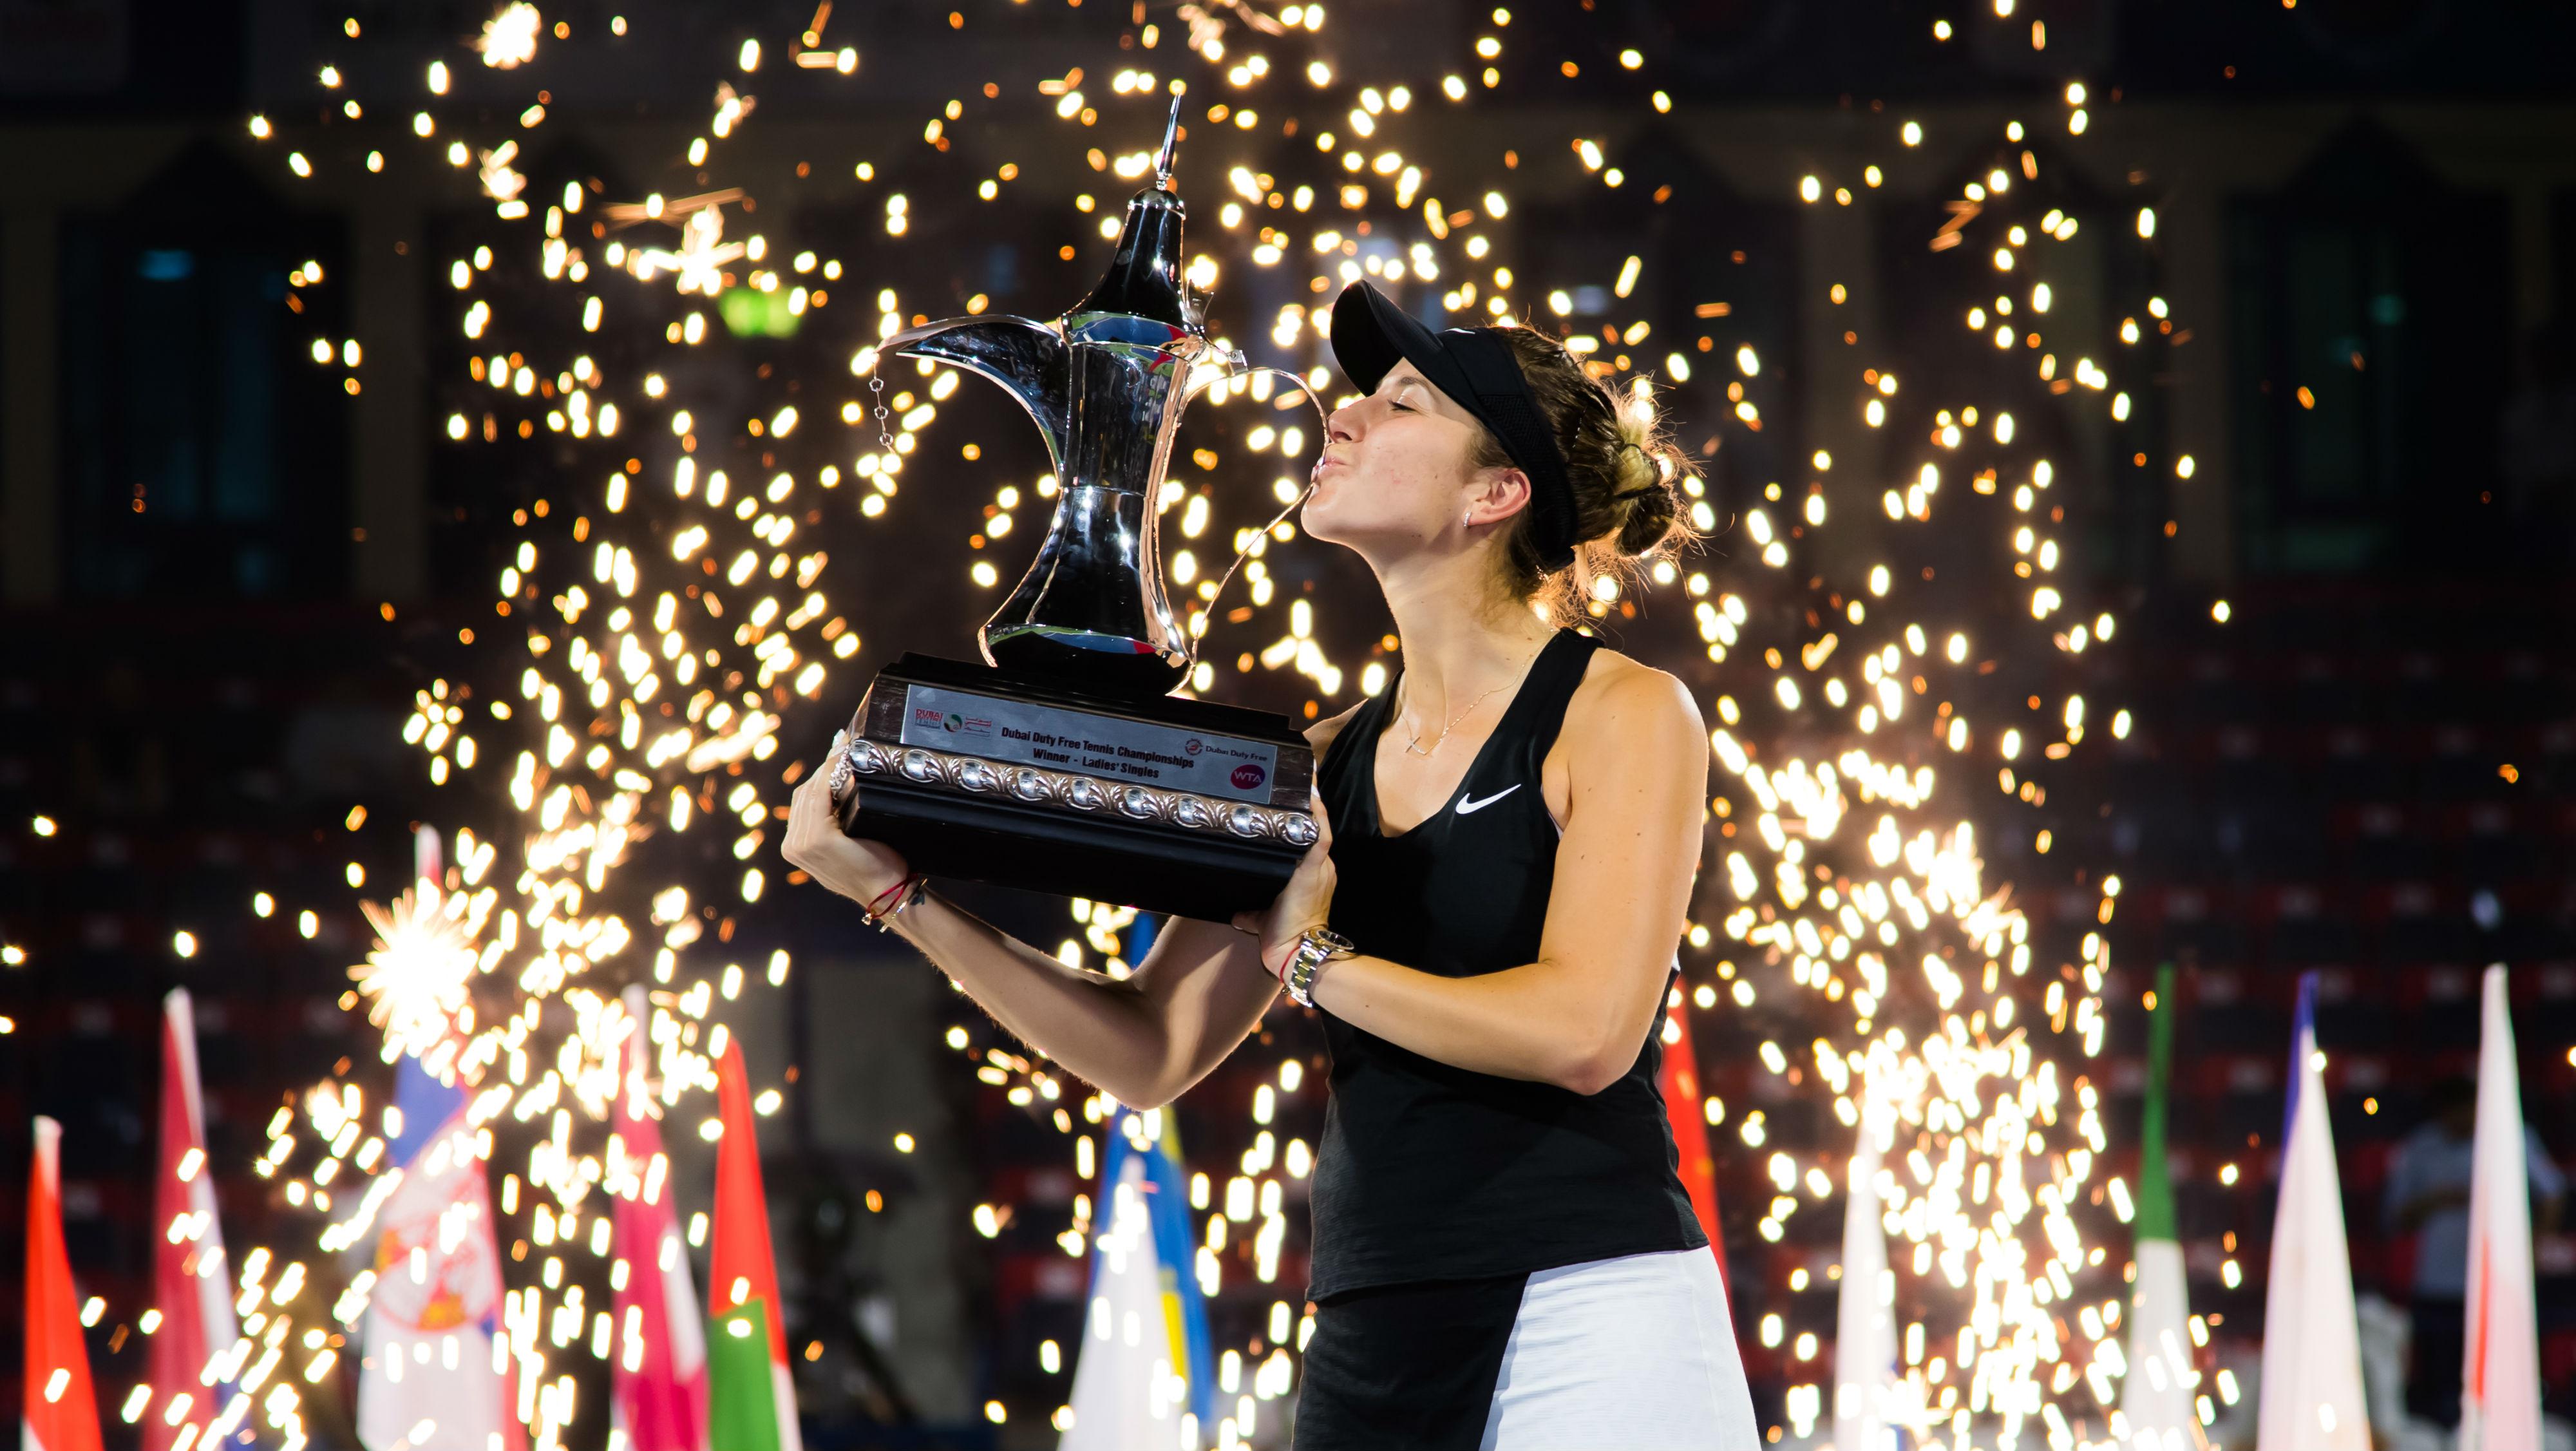 2019 WTA Tournament award winners: The reaction